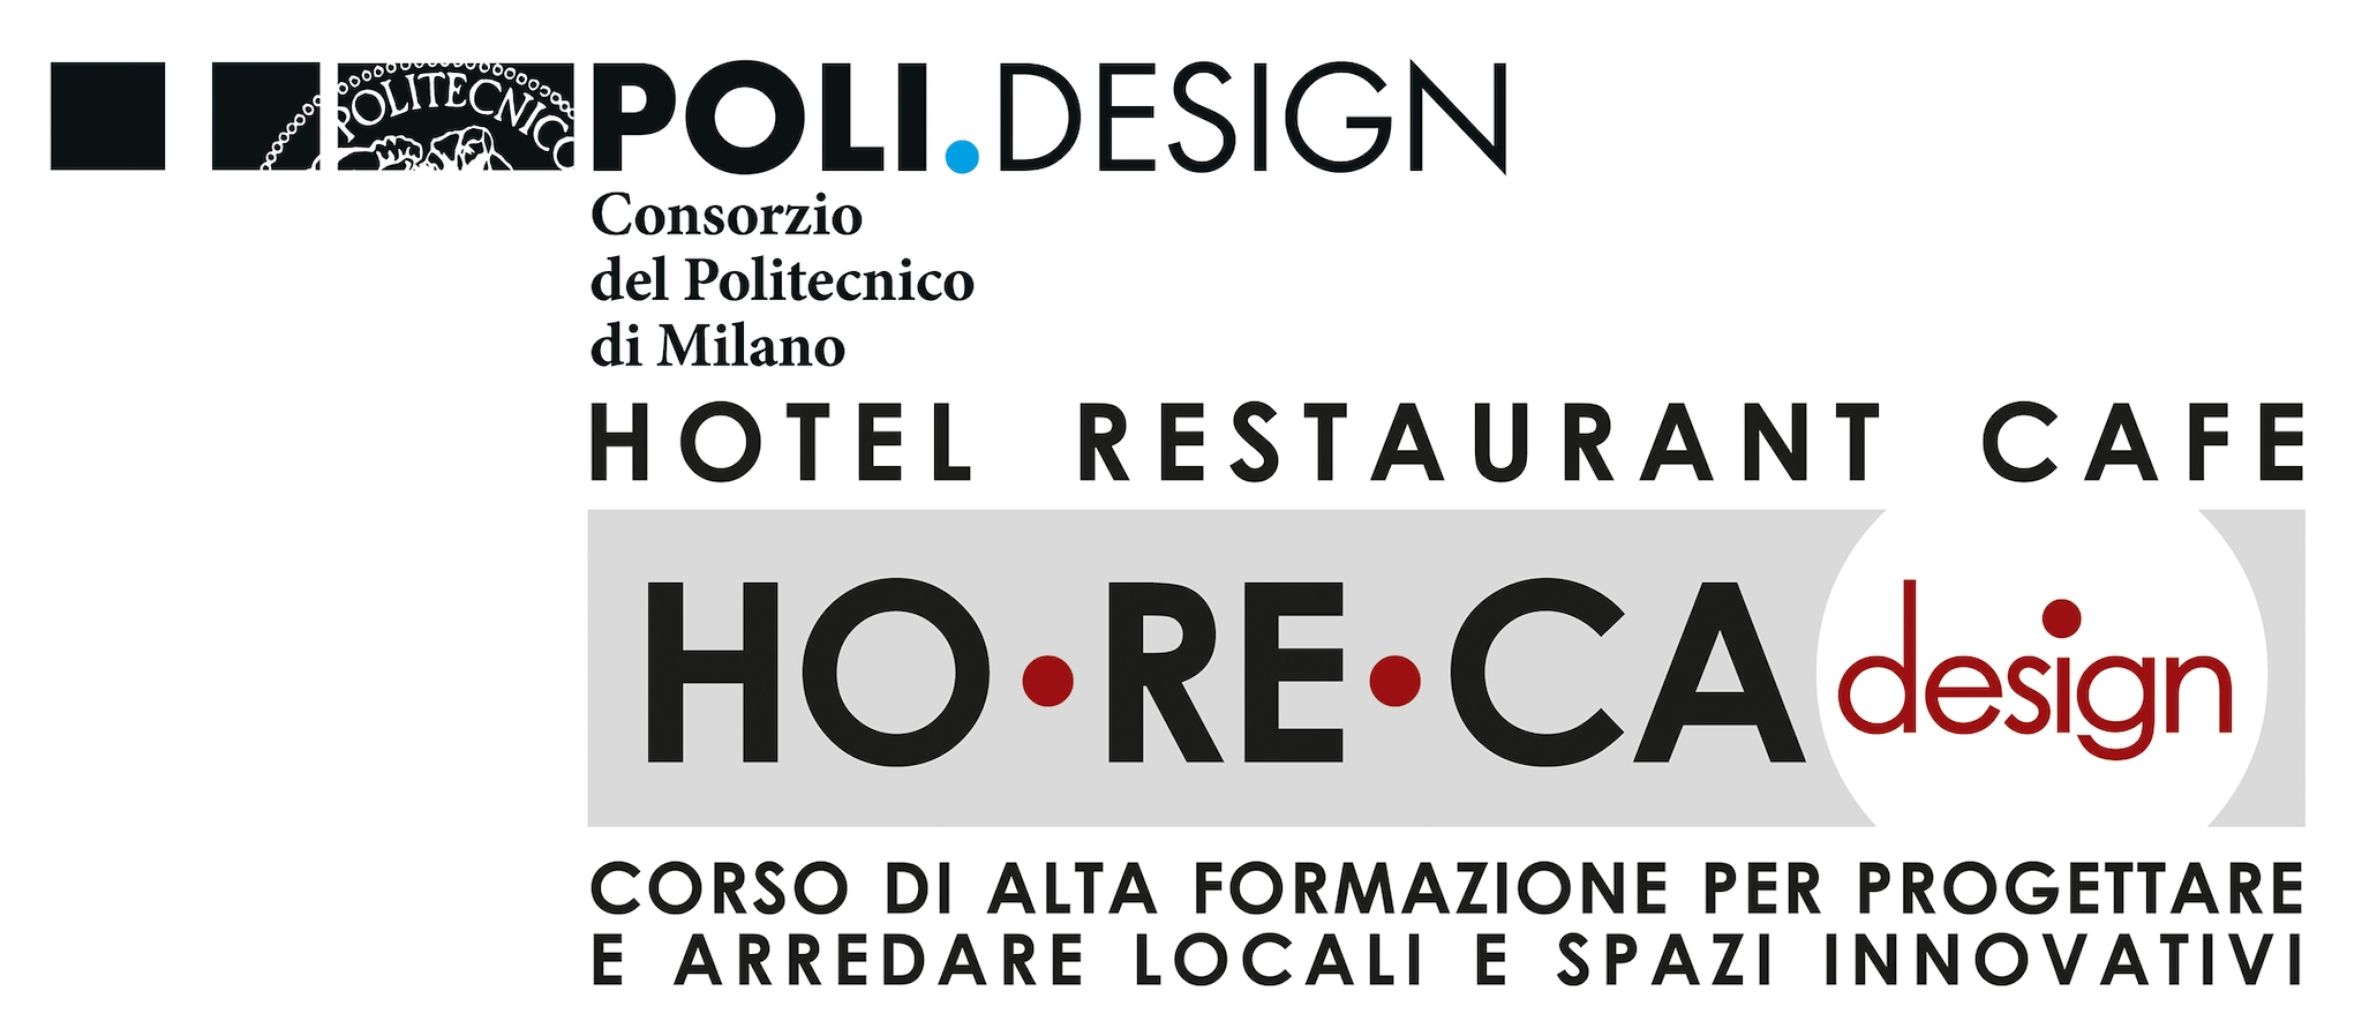 New HoReCa Design course at POLI.design